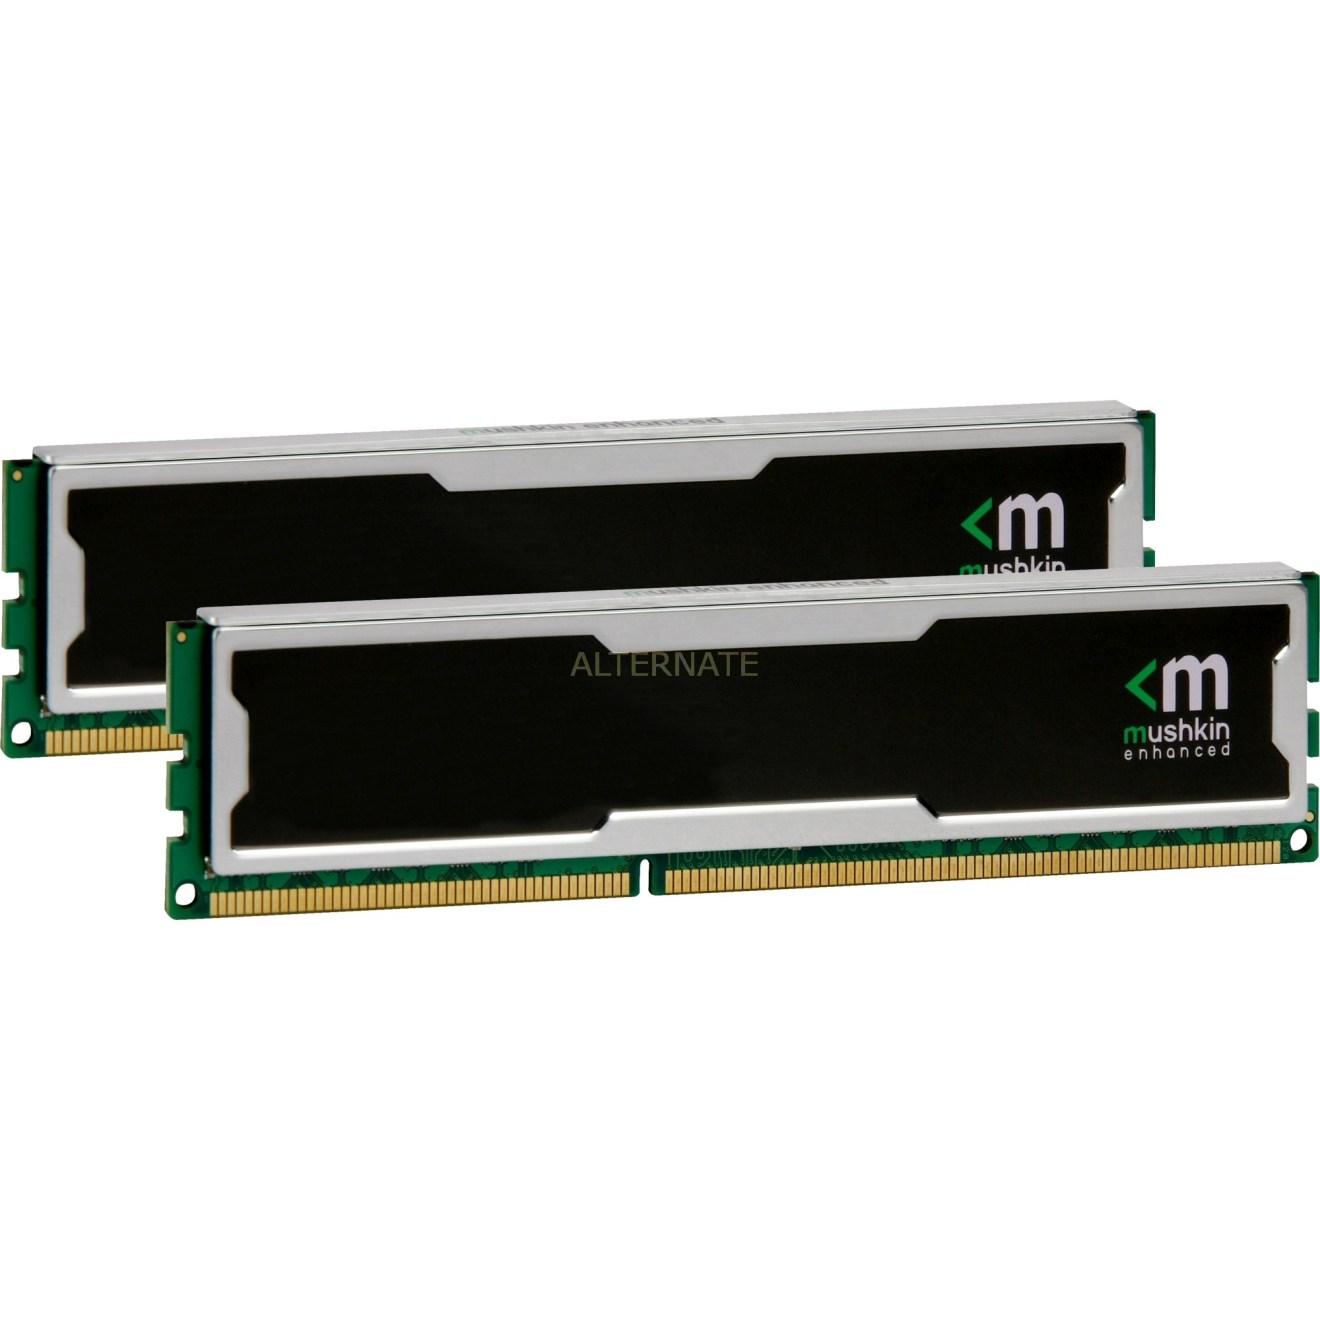 DIMM 2 GB DDR-400 Kit, Mémoire Acer Aspire E 15 E5-575G-53VG Laptop, 15.6 Full HD (Intel Core i5, NVIDIA 940MX, 8GB DDR4, 256GB SSD, Windows 10) Acer Aspire E 15 E5-575G-53VG Laptop, 15.6 Full HD (Intel Core i5, NVIDIA 940MX, 8GB DDR4, 256GB SSD, Windows 10) Mushkin DIMM 2 GB DDR 400 Kit  M moire  ibiduc